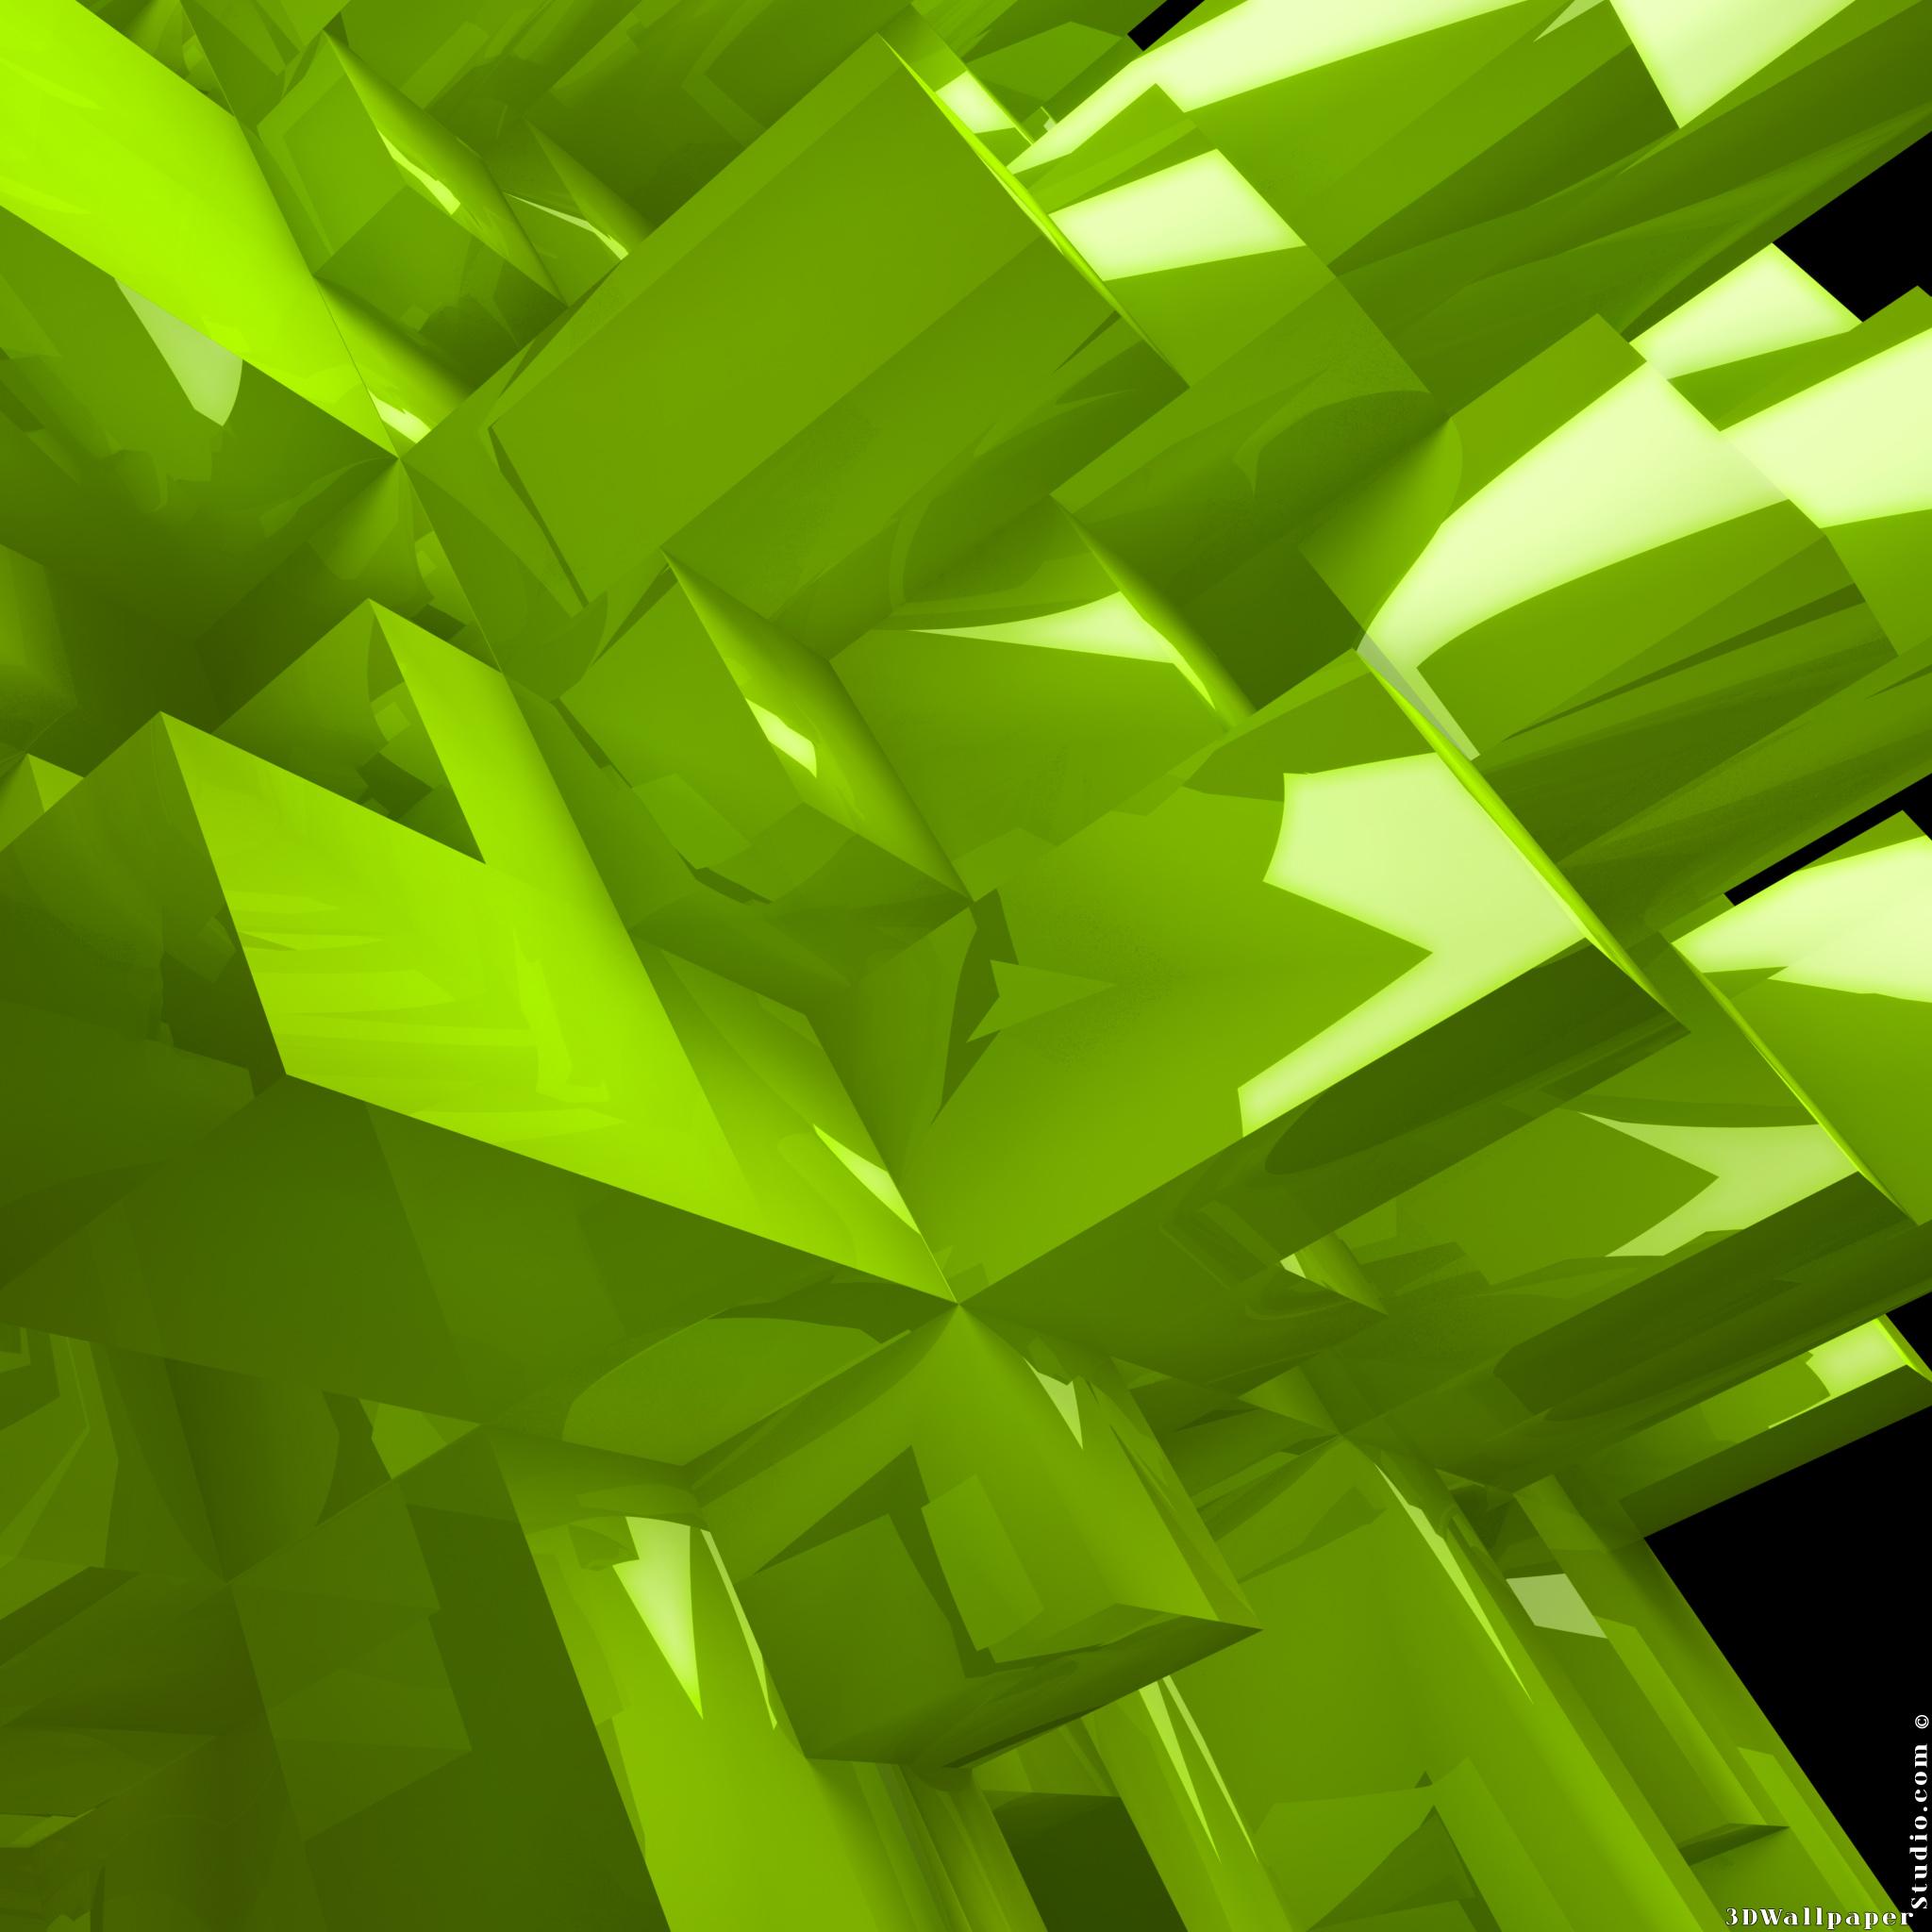 3D Wallpaper Mad cube 2048 x 2048 2048x2048